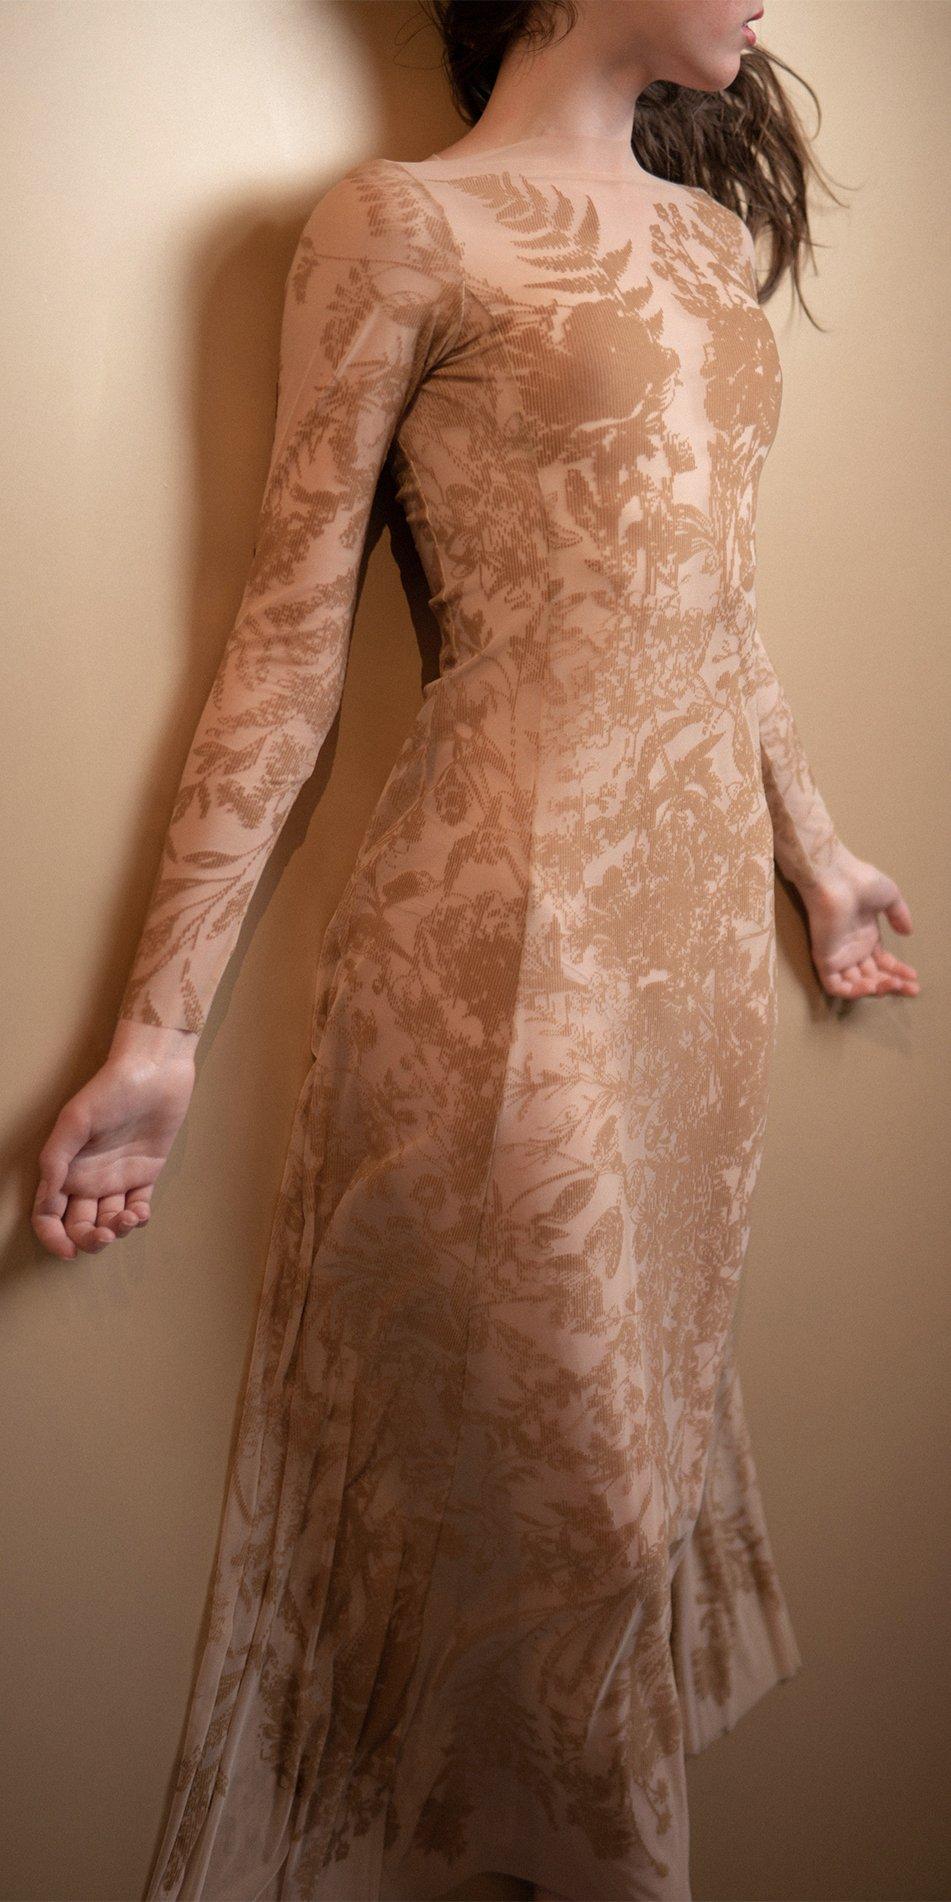 BLOSSOMS nude second skin flock print dress 5